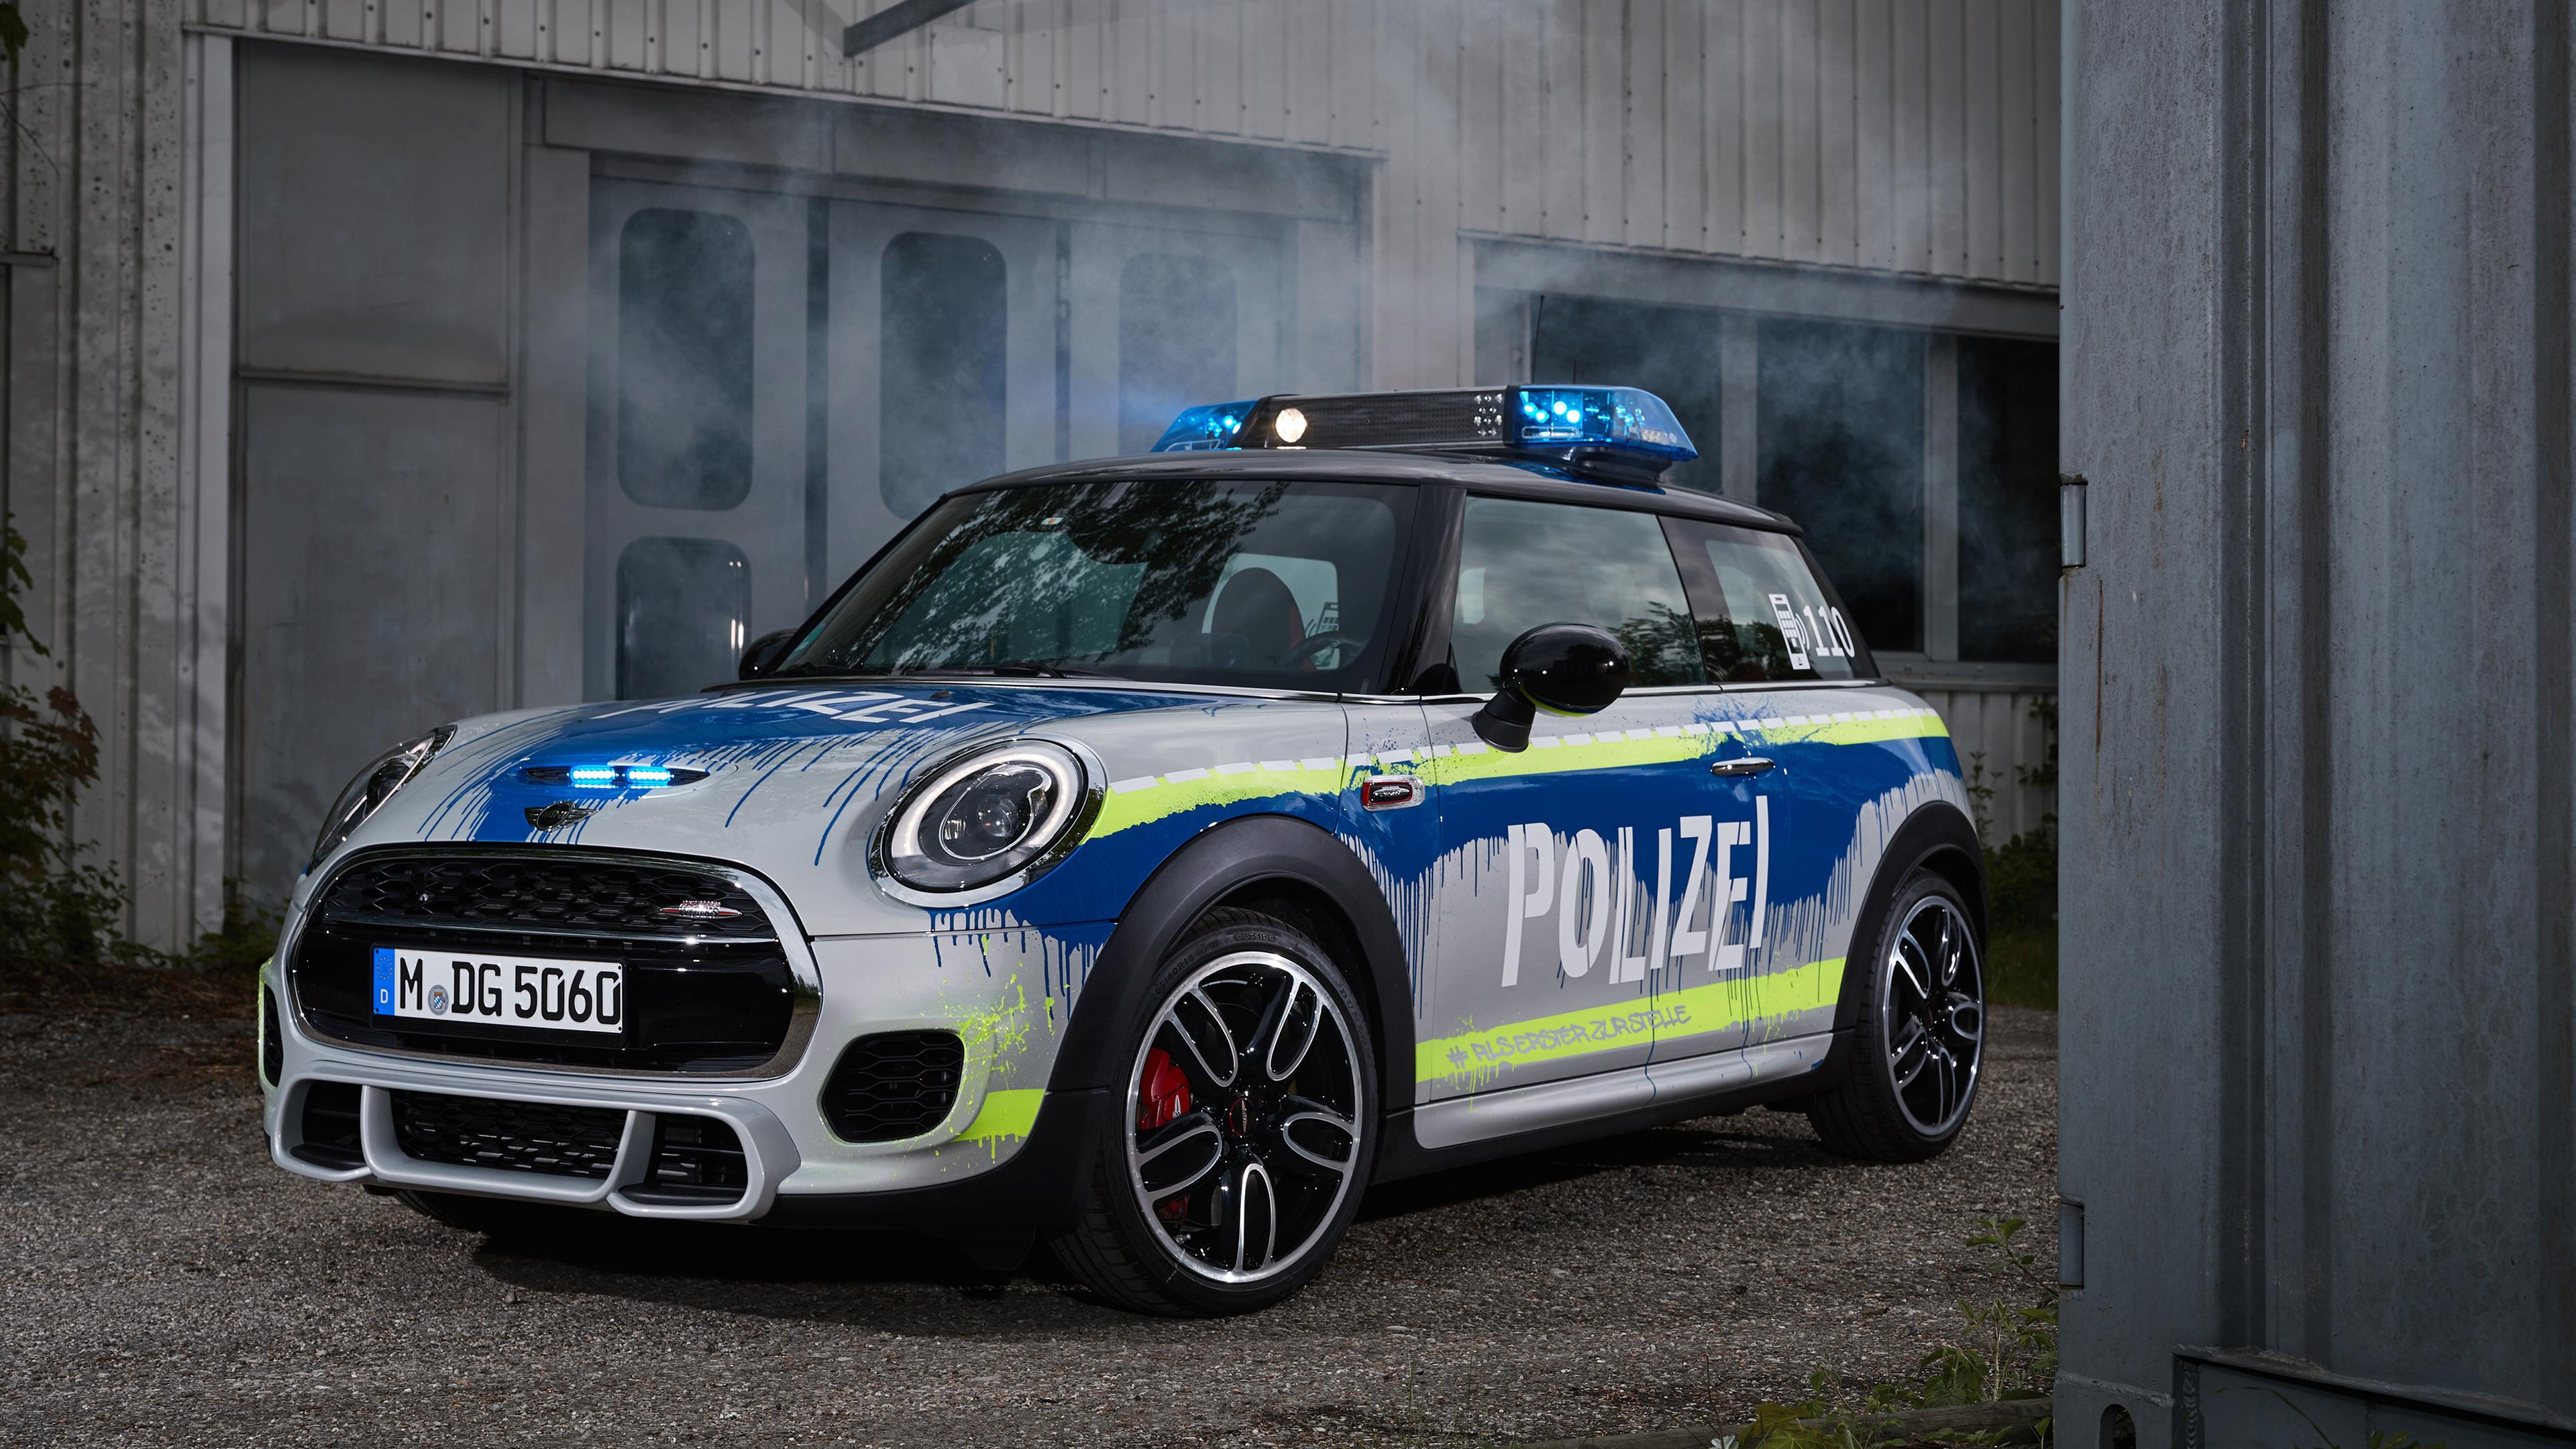 mini john cooper works polizei 2018 1539111316 - MINI John Cooper Works Polizei 2018 - mini cooper wallpapers, hd-wallpapers, cars wallpapers, 4k-wallpapers, 2018 cars wallpapers